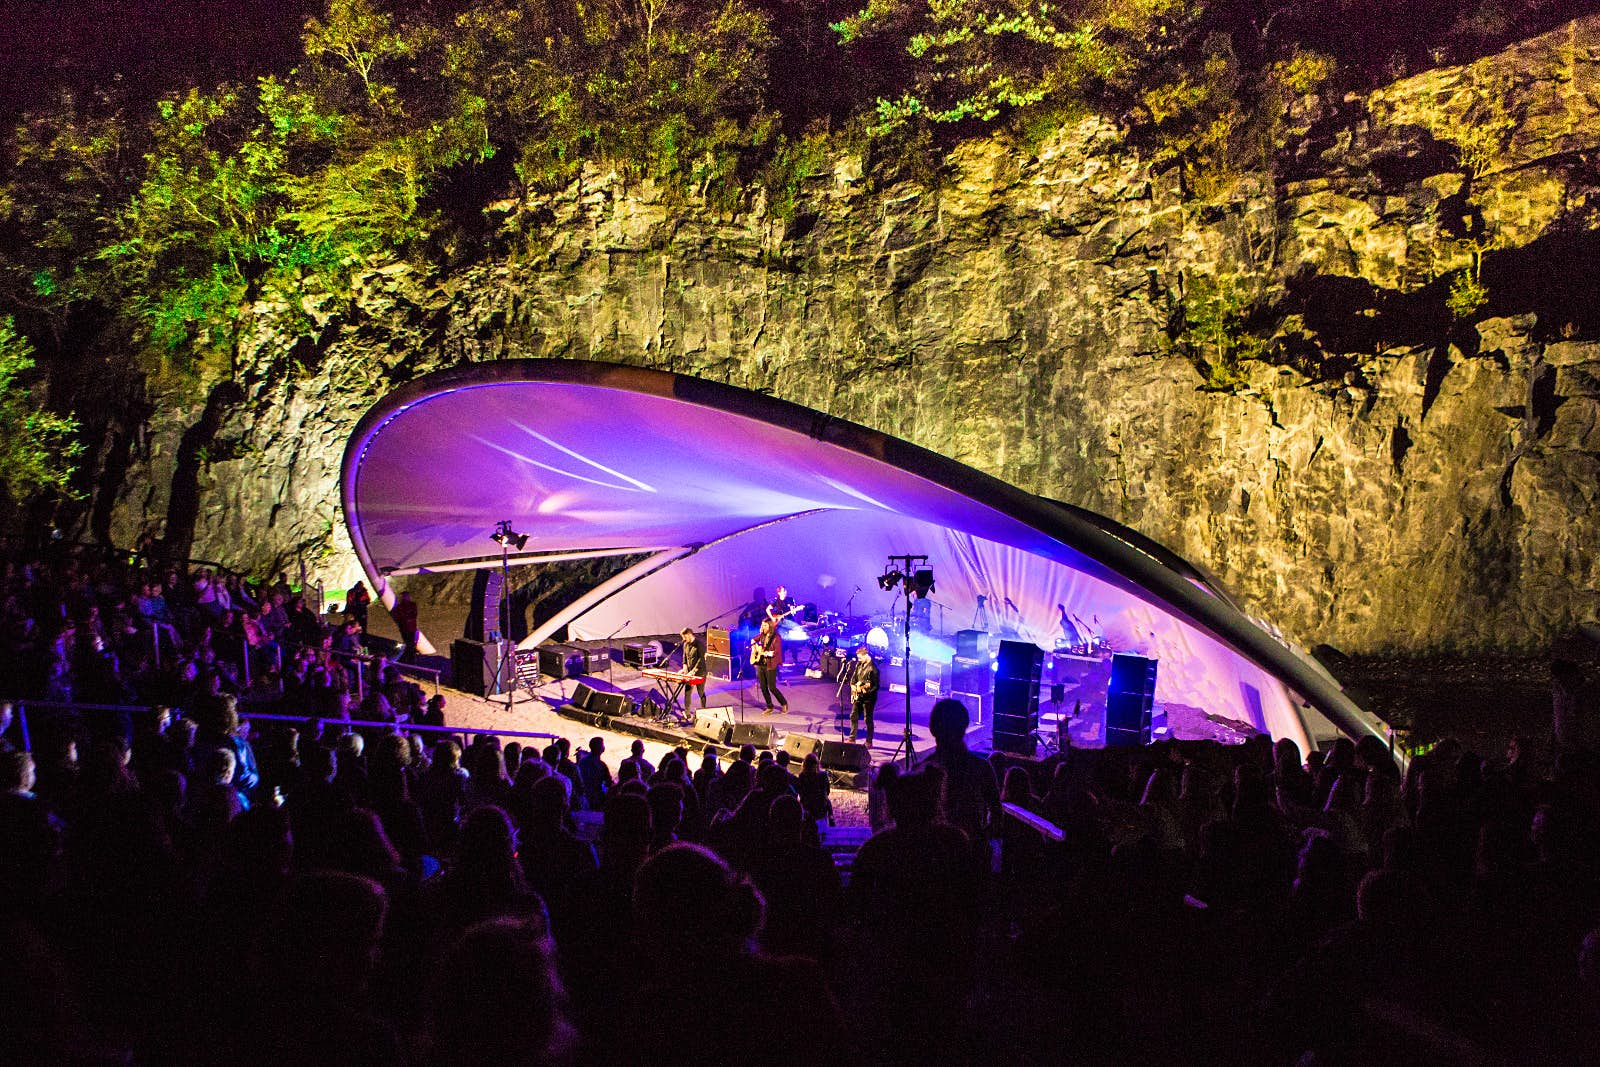 The Riptide Movement perform at Ballykeefe Amphitheatre © Michael Duggan